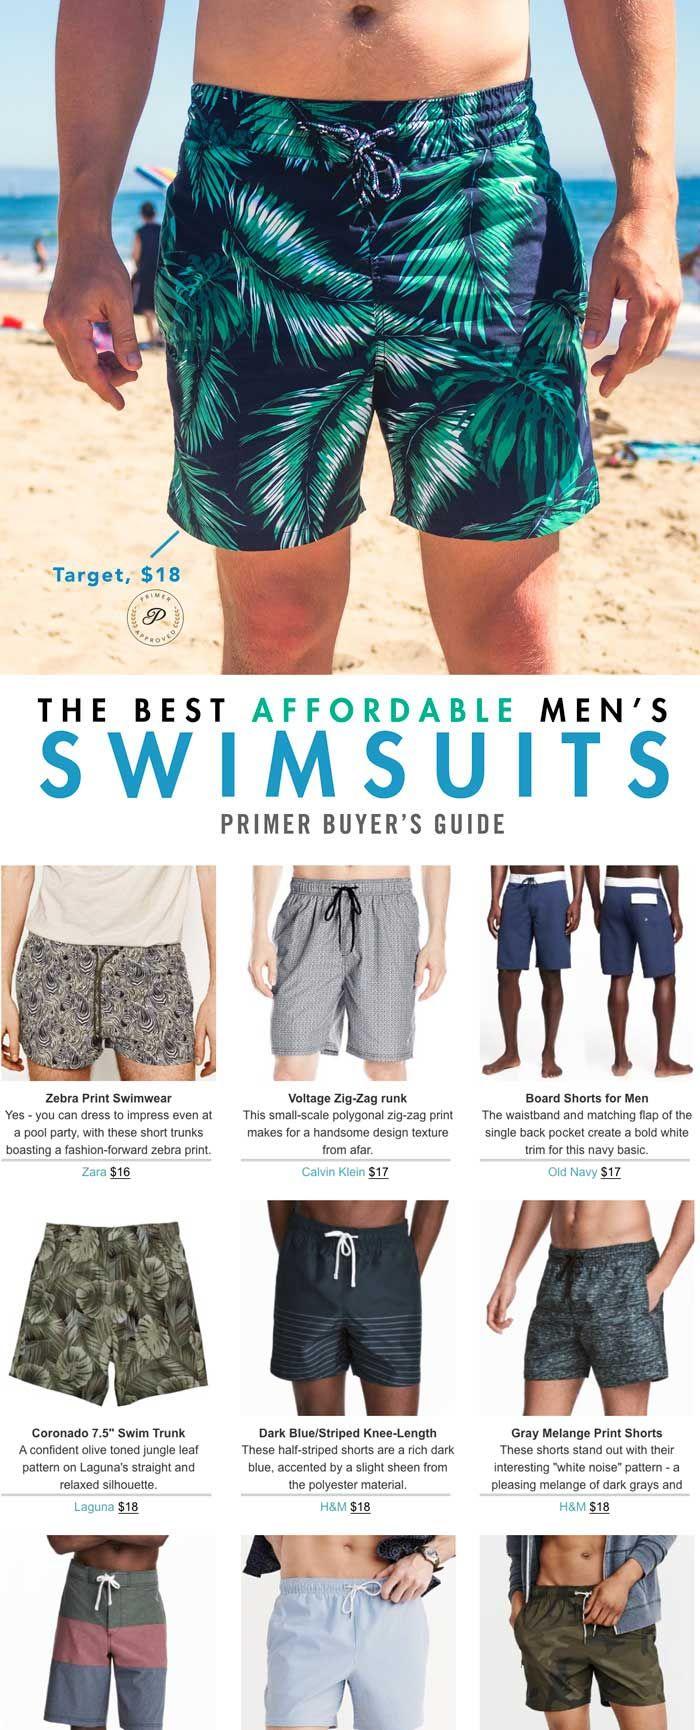 aa93d3c41f The Best Affordable Men's Swim Trunks | GQ | Swim trunks, Man ...